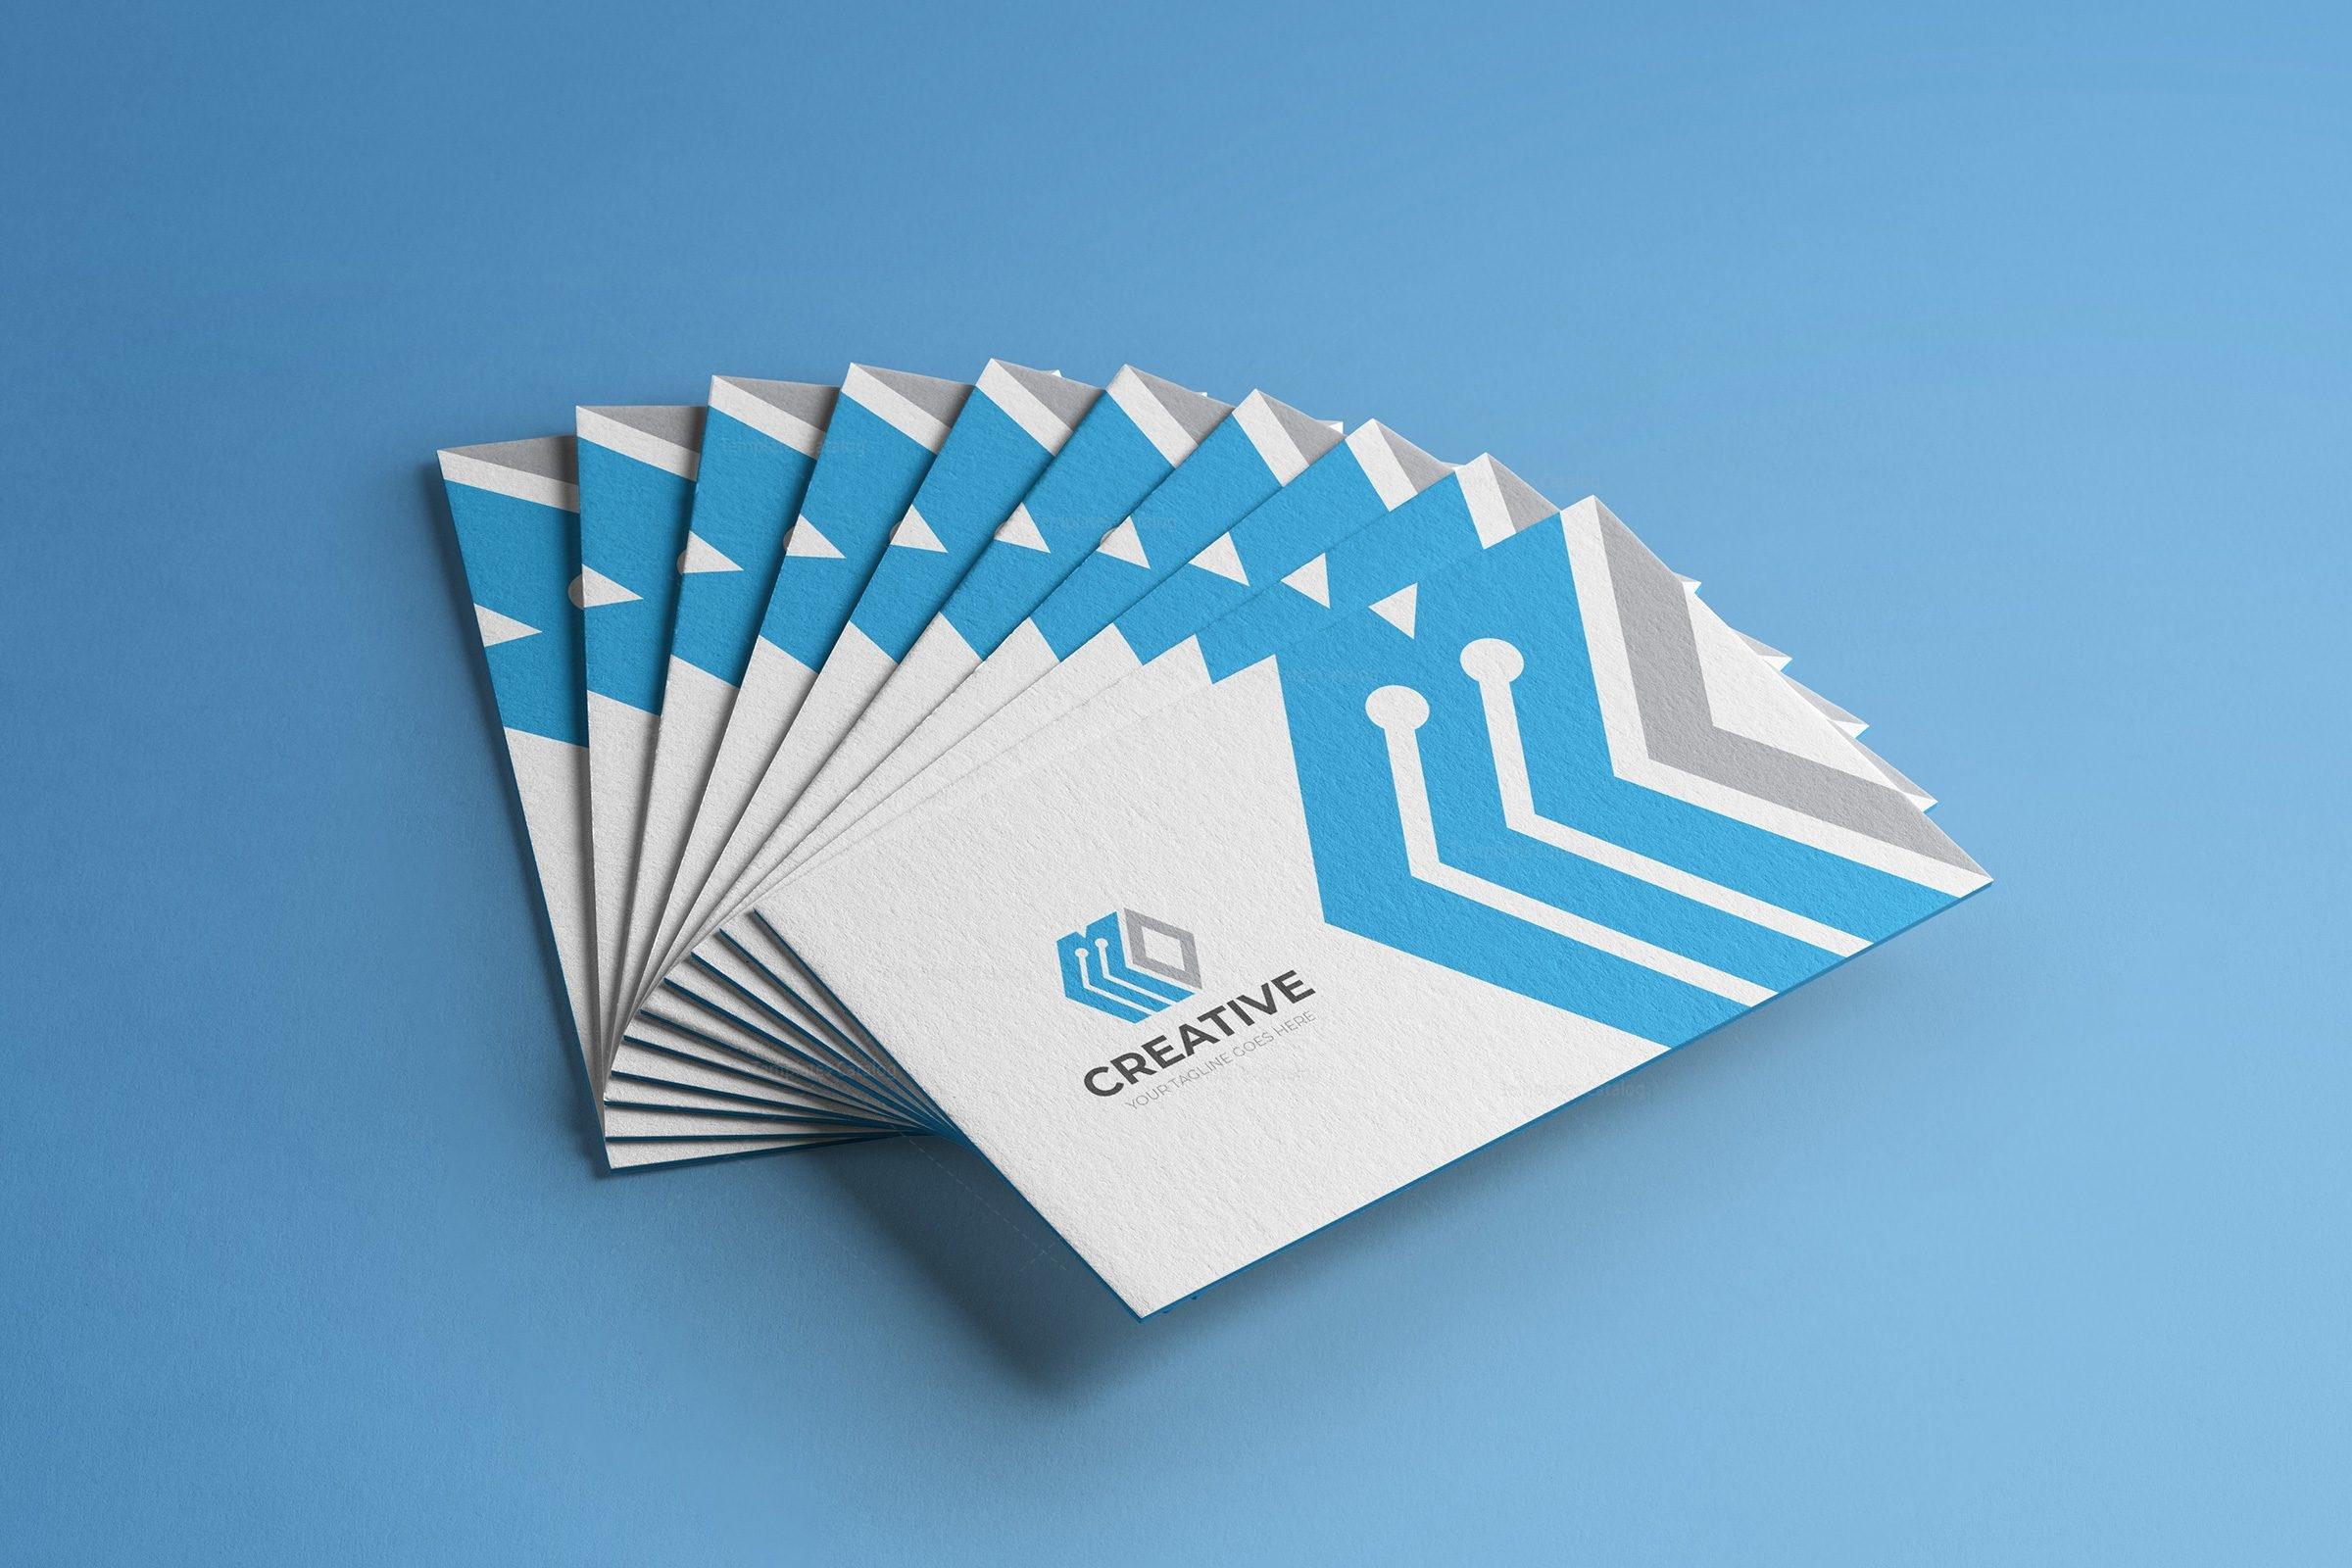 London Creative Business Card Design Template 001783 - Template Catalog